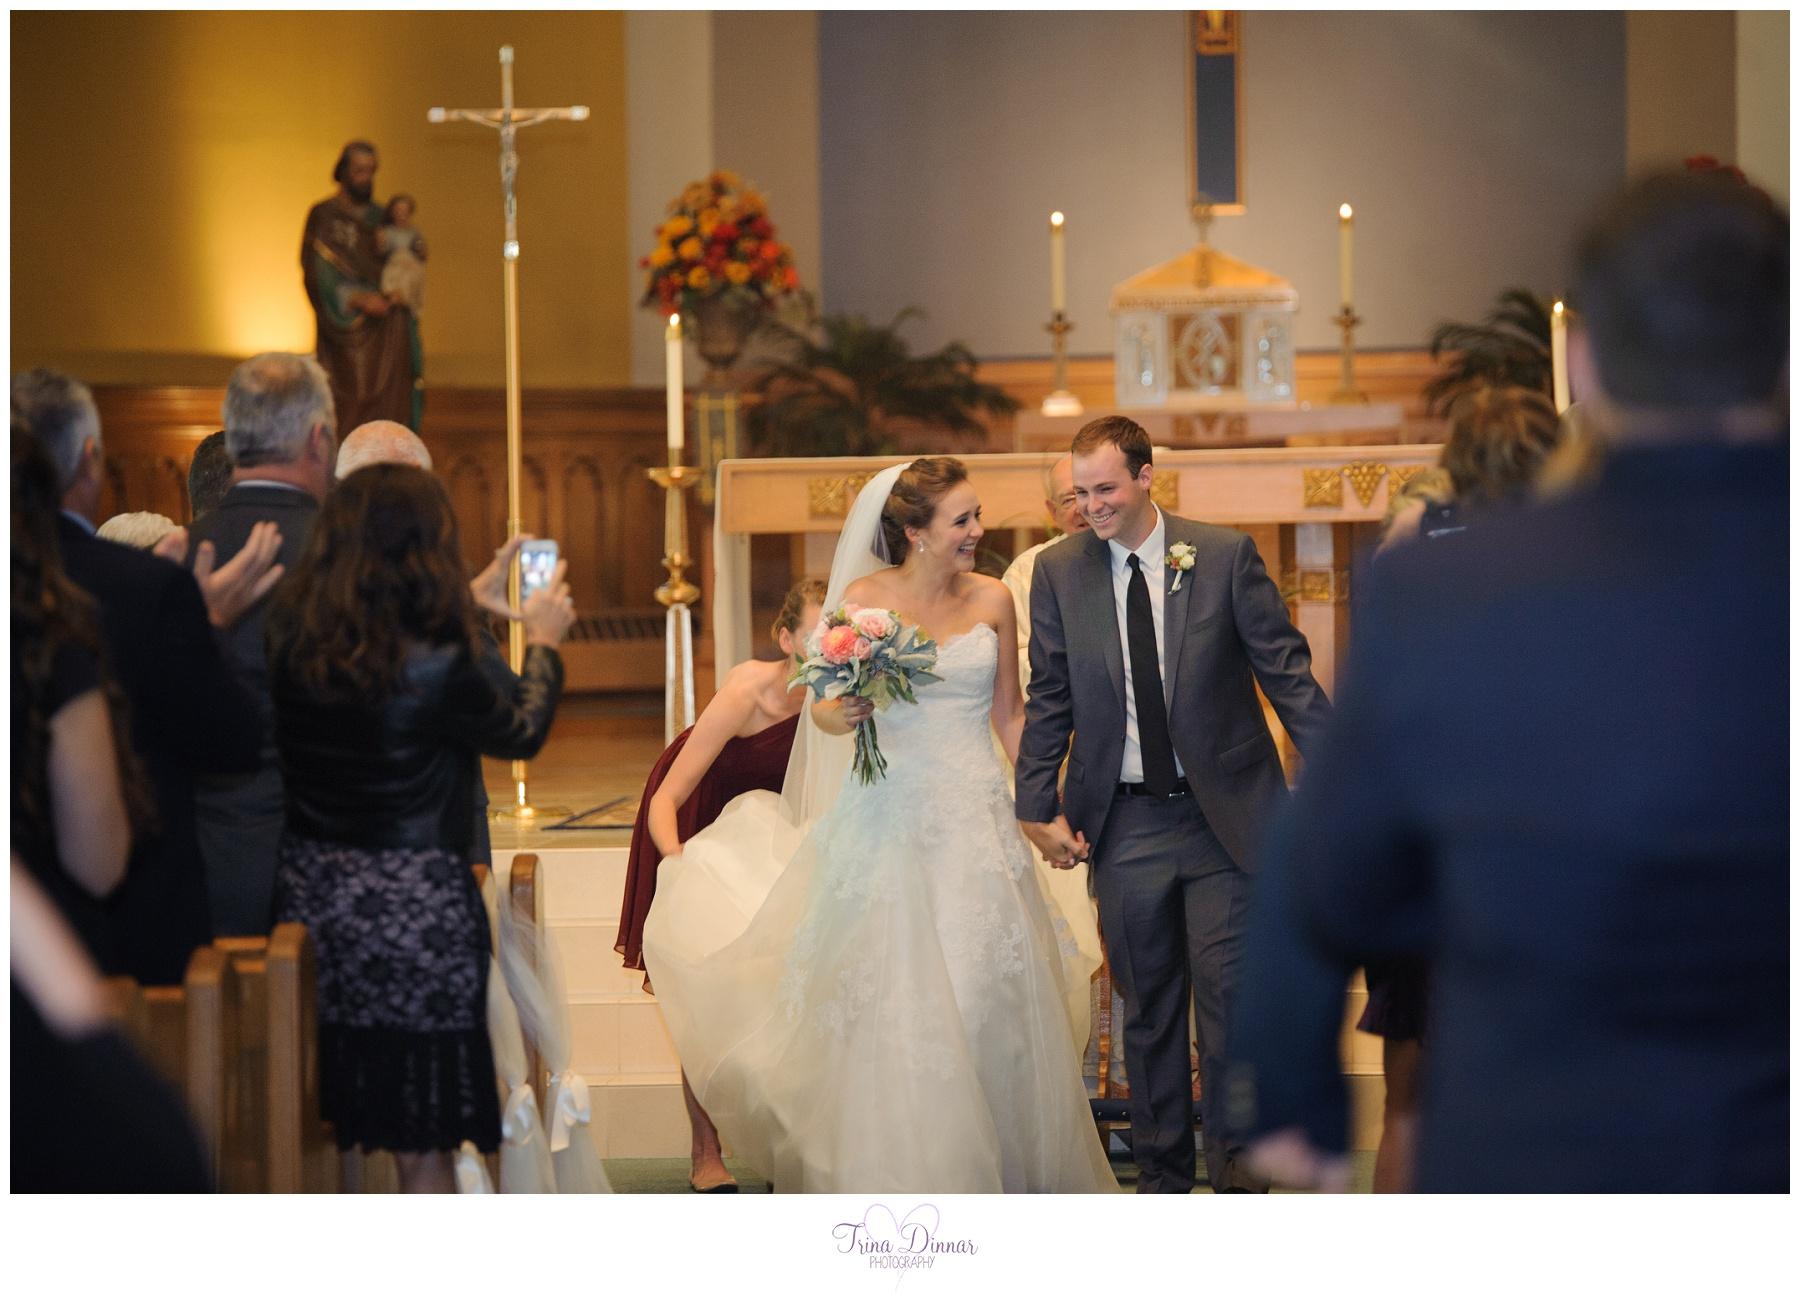 Weddings at St. Joseph's Church in Biddeford Maine